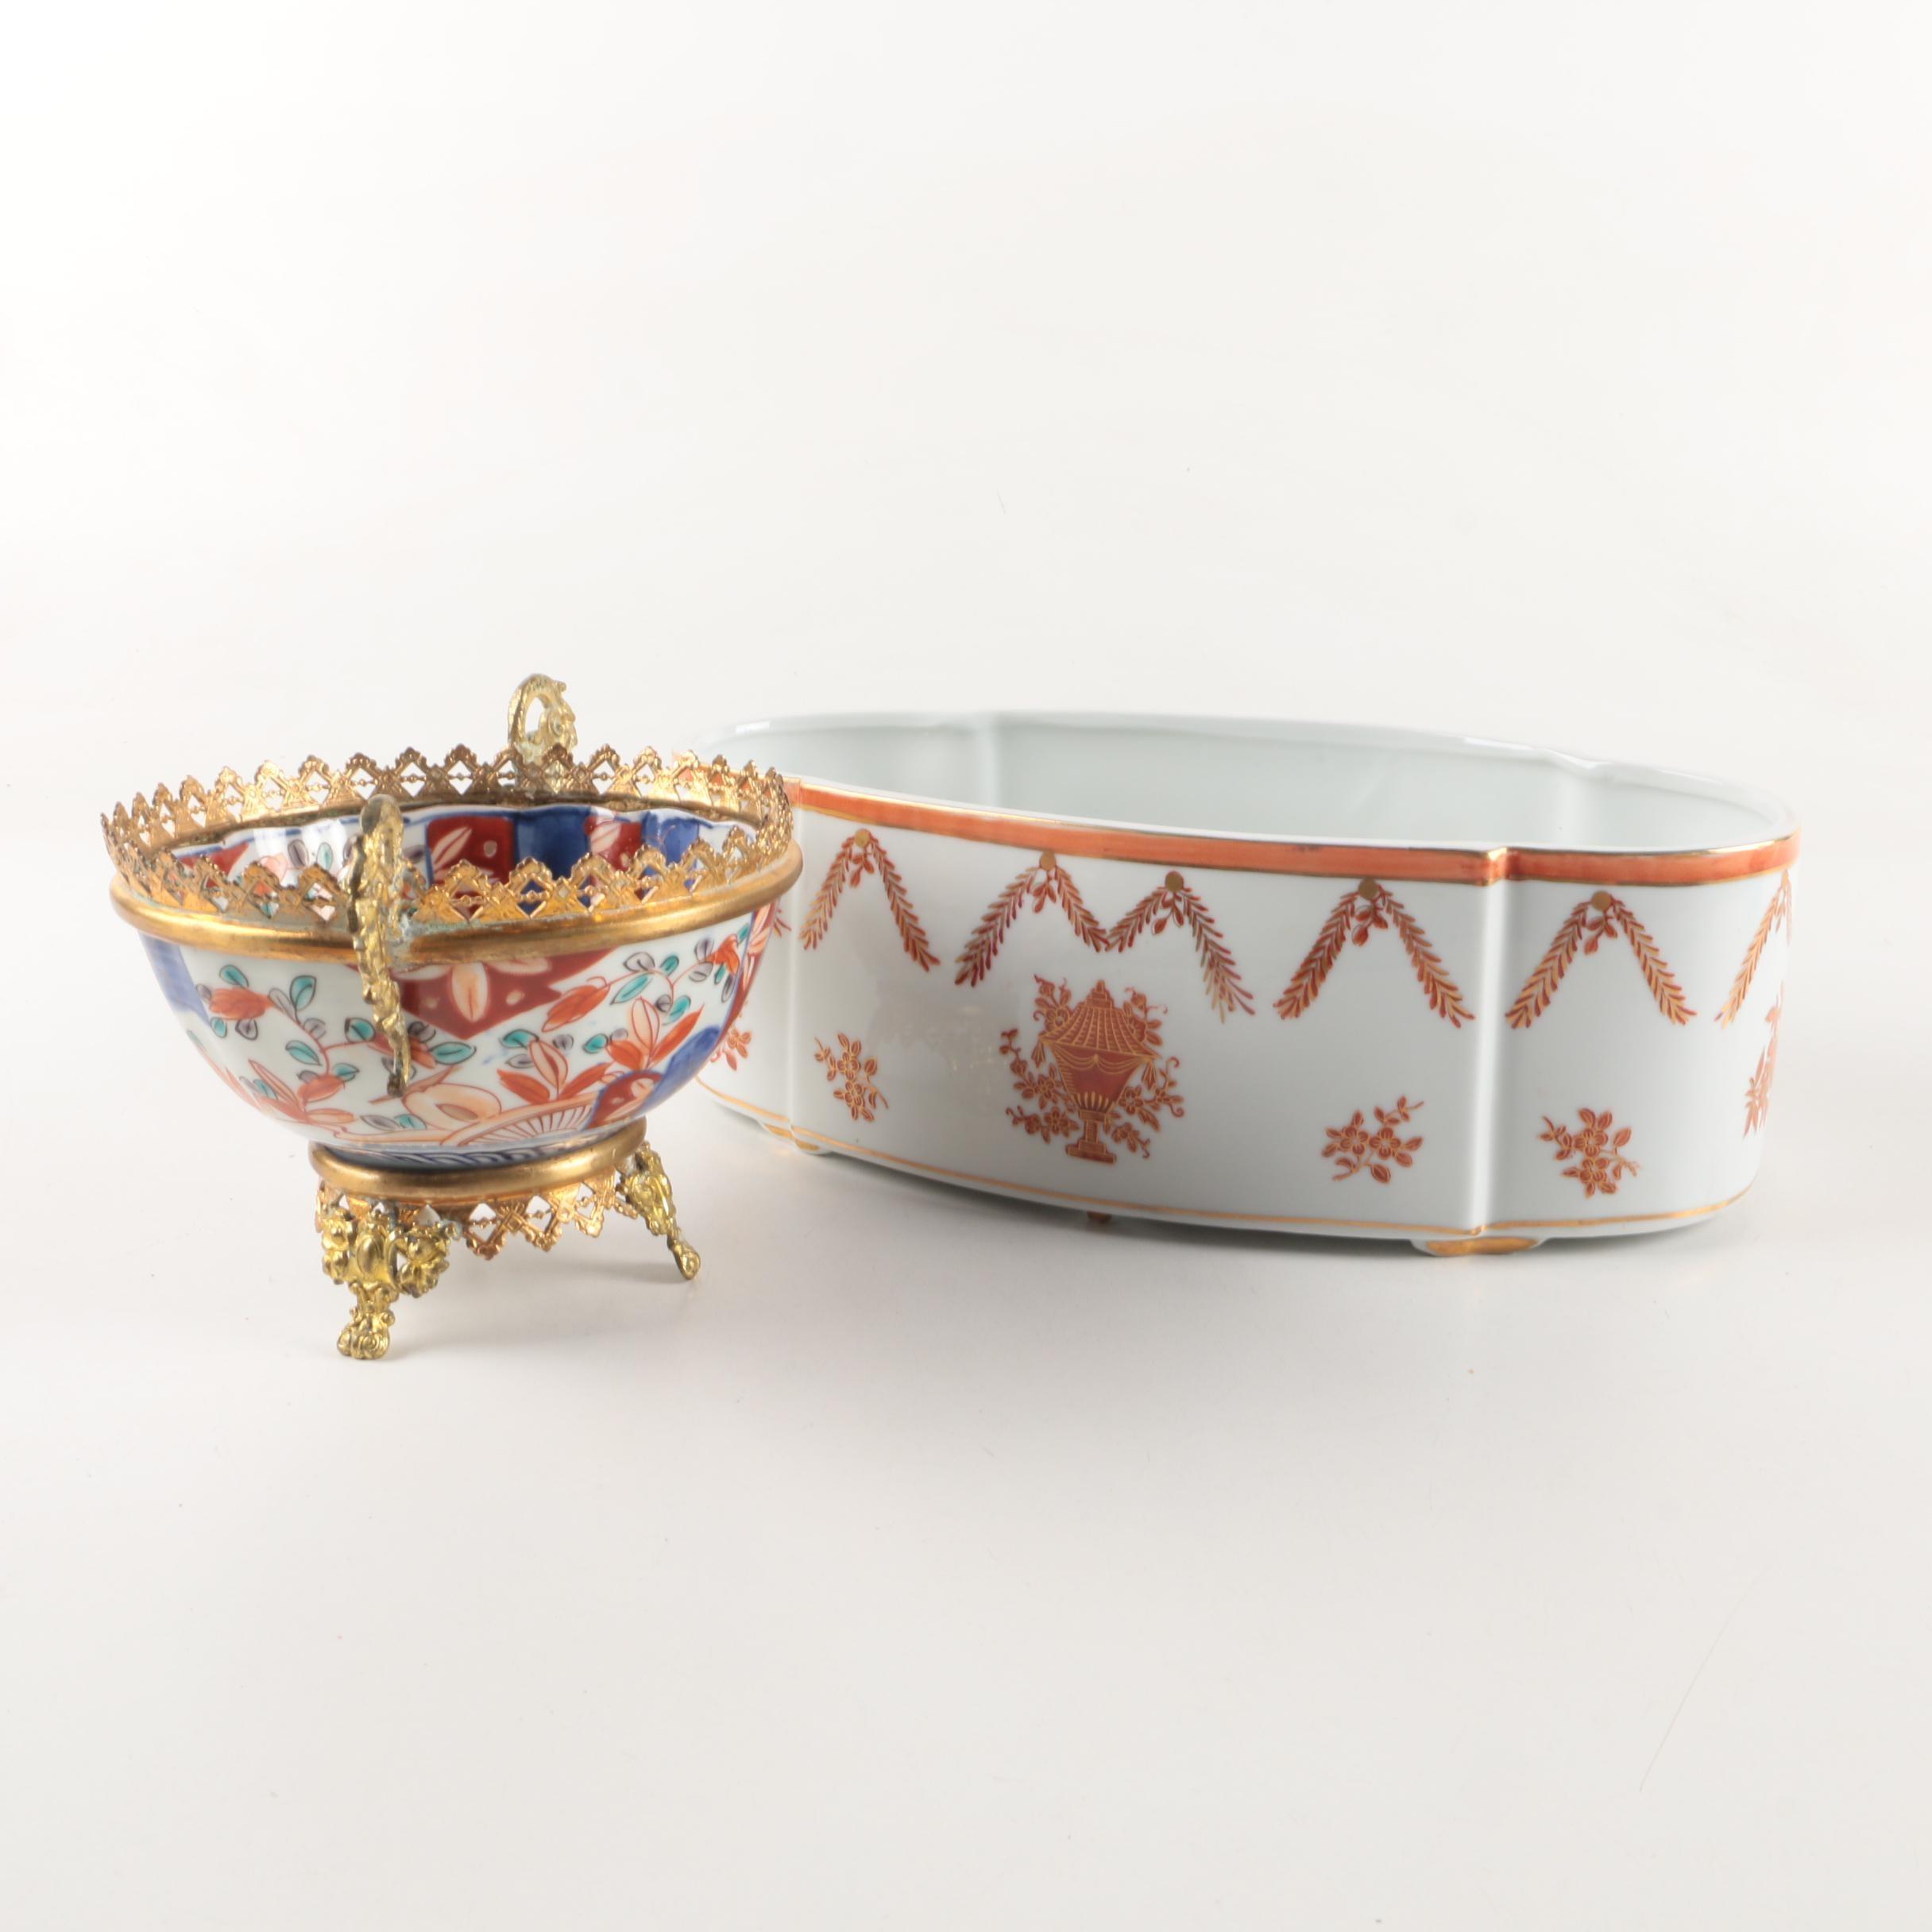 Asian Inspired Porcelain Bowls